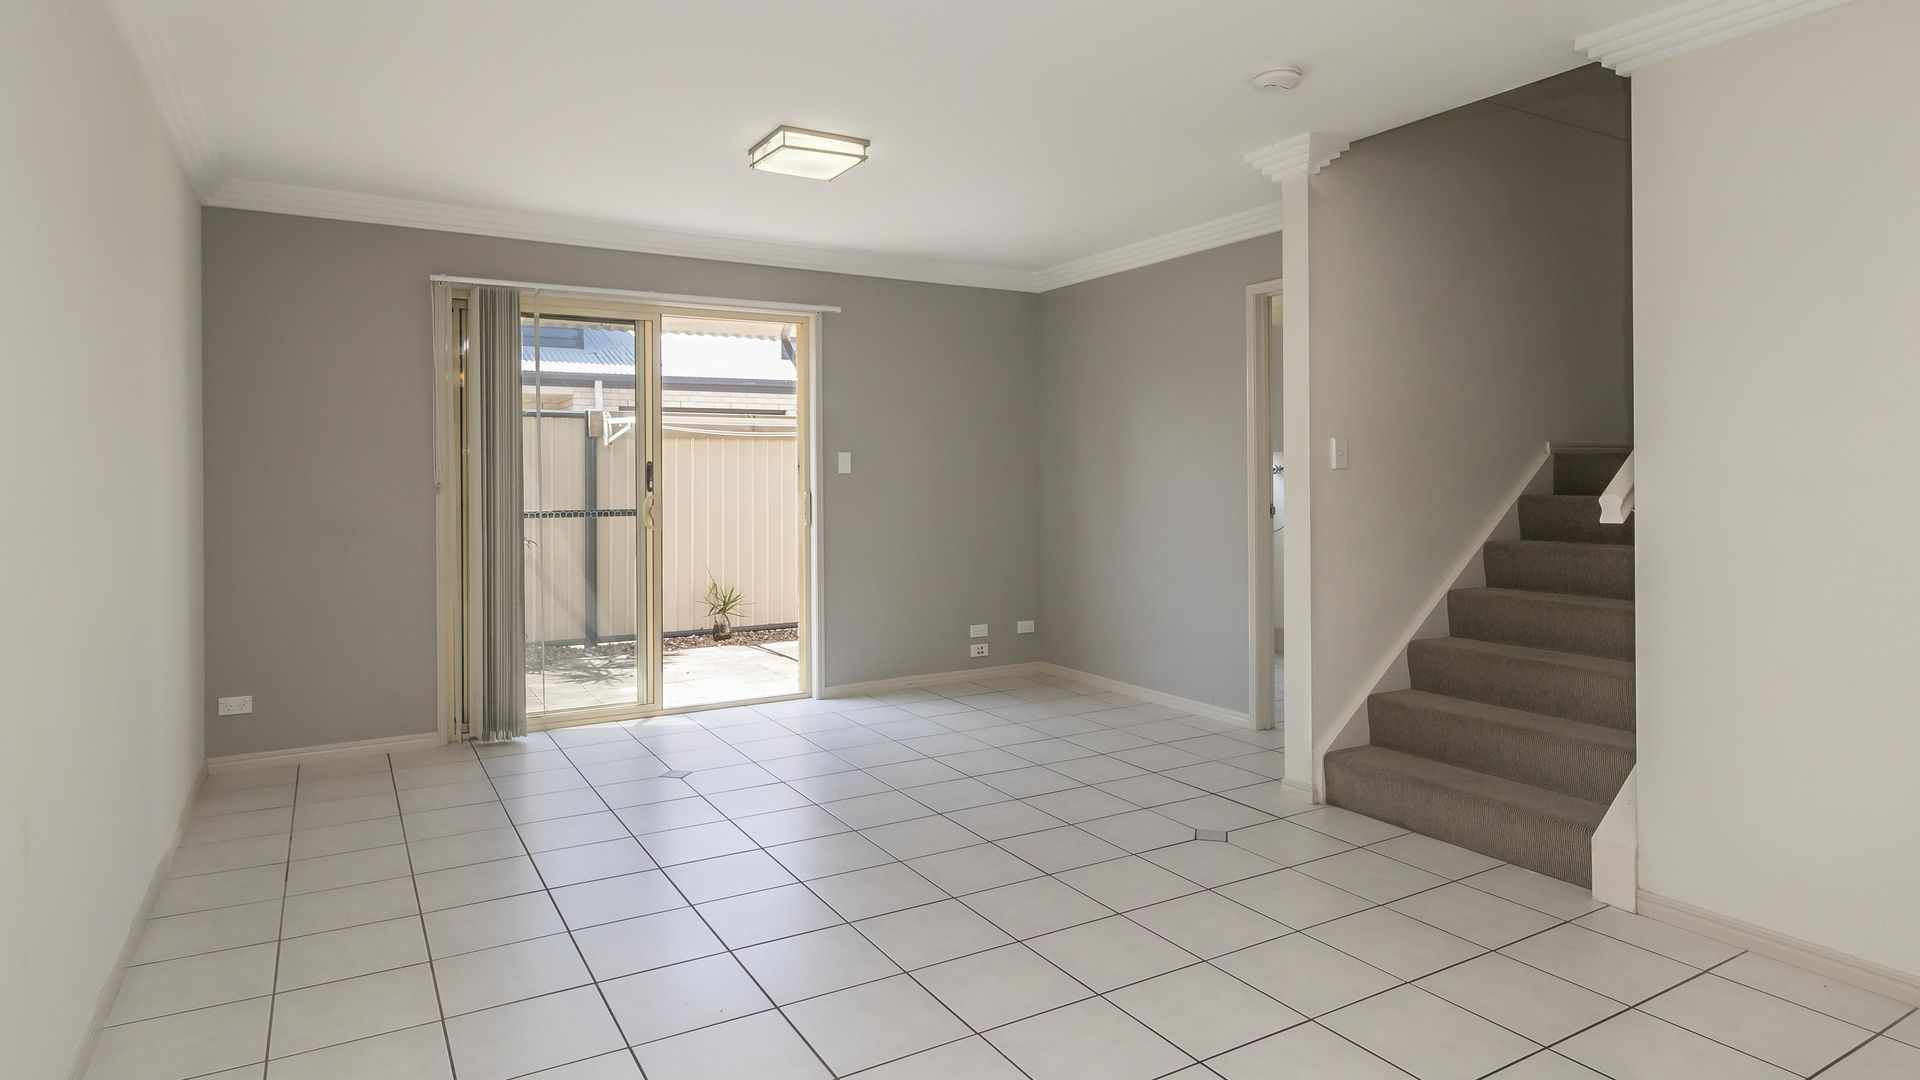 8/66 Winchelsea Street, Pialba QLD 4655, Image 2